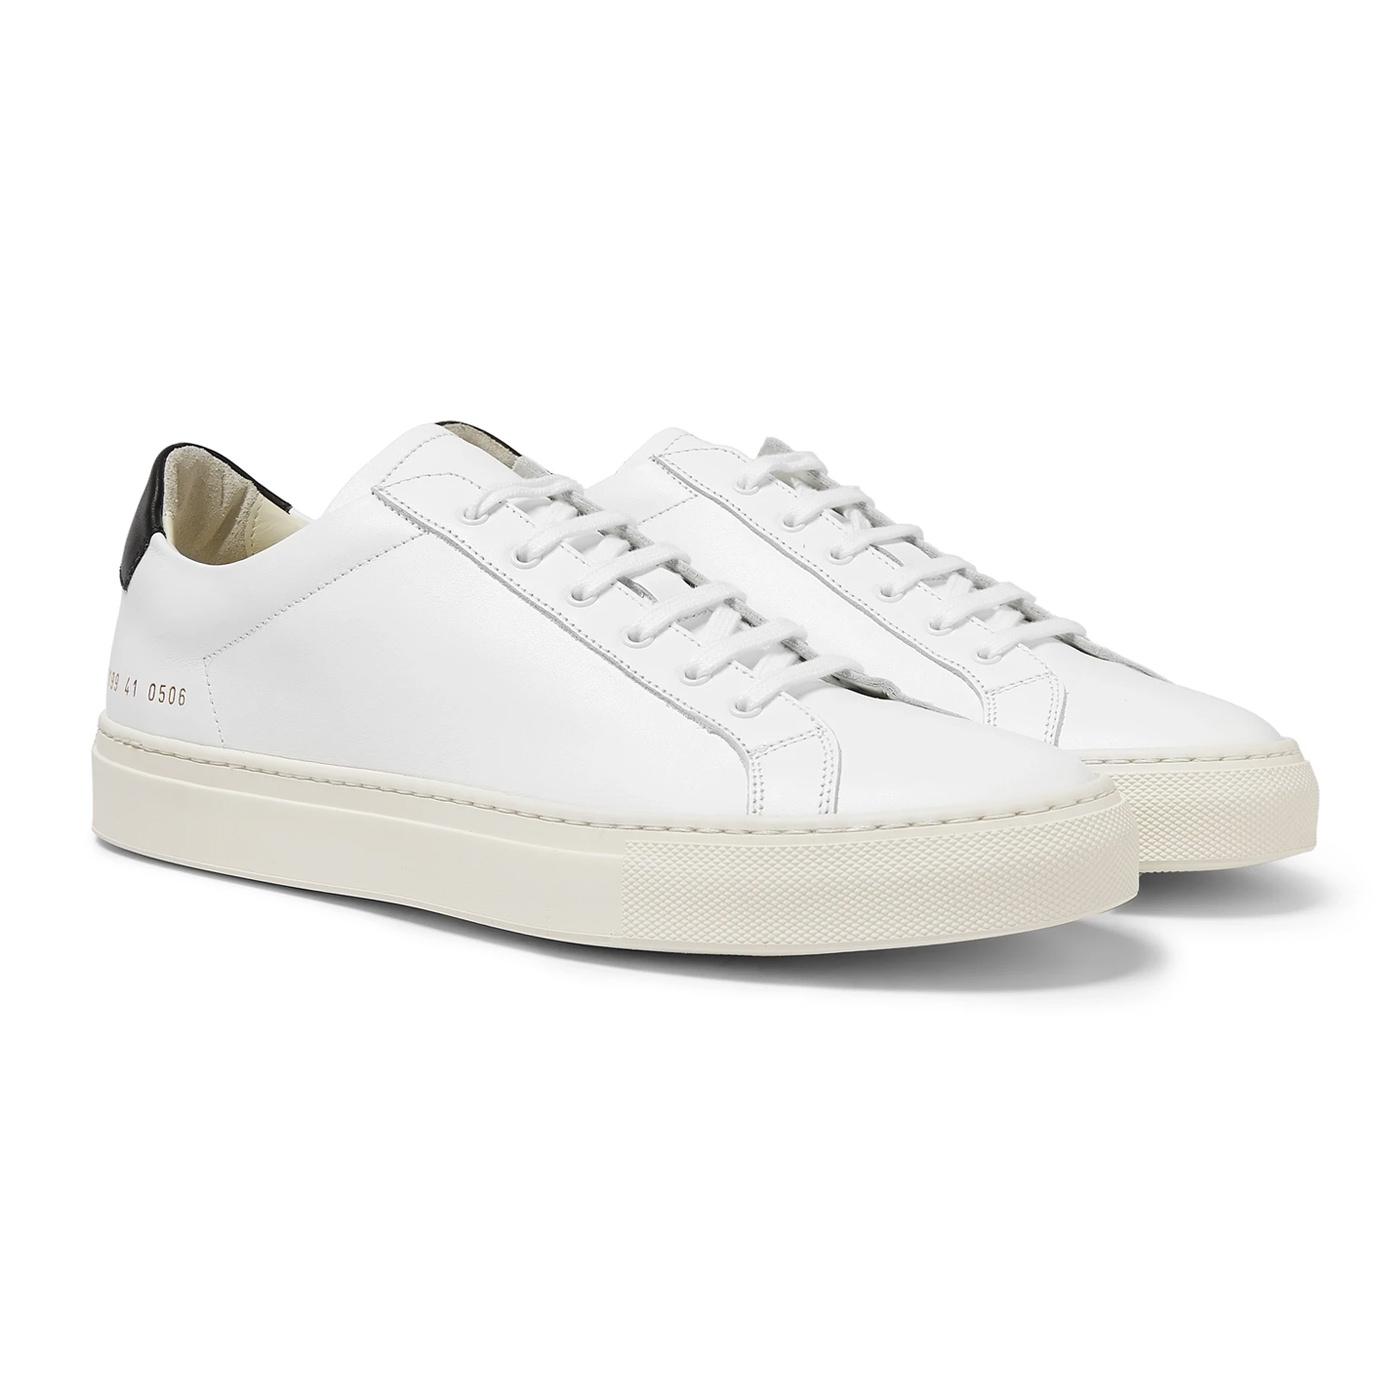 Style Mr Porter Sneakers Common Projects Original Achilles Cuir Retro